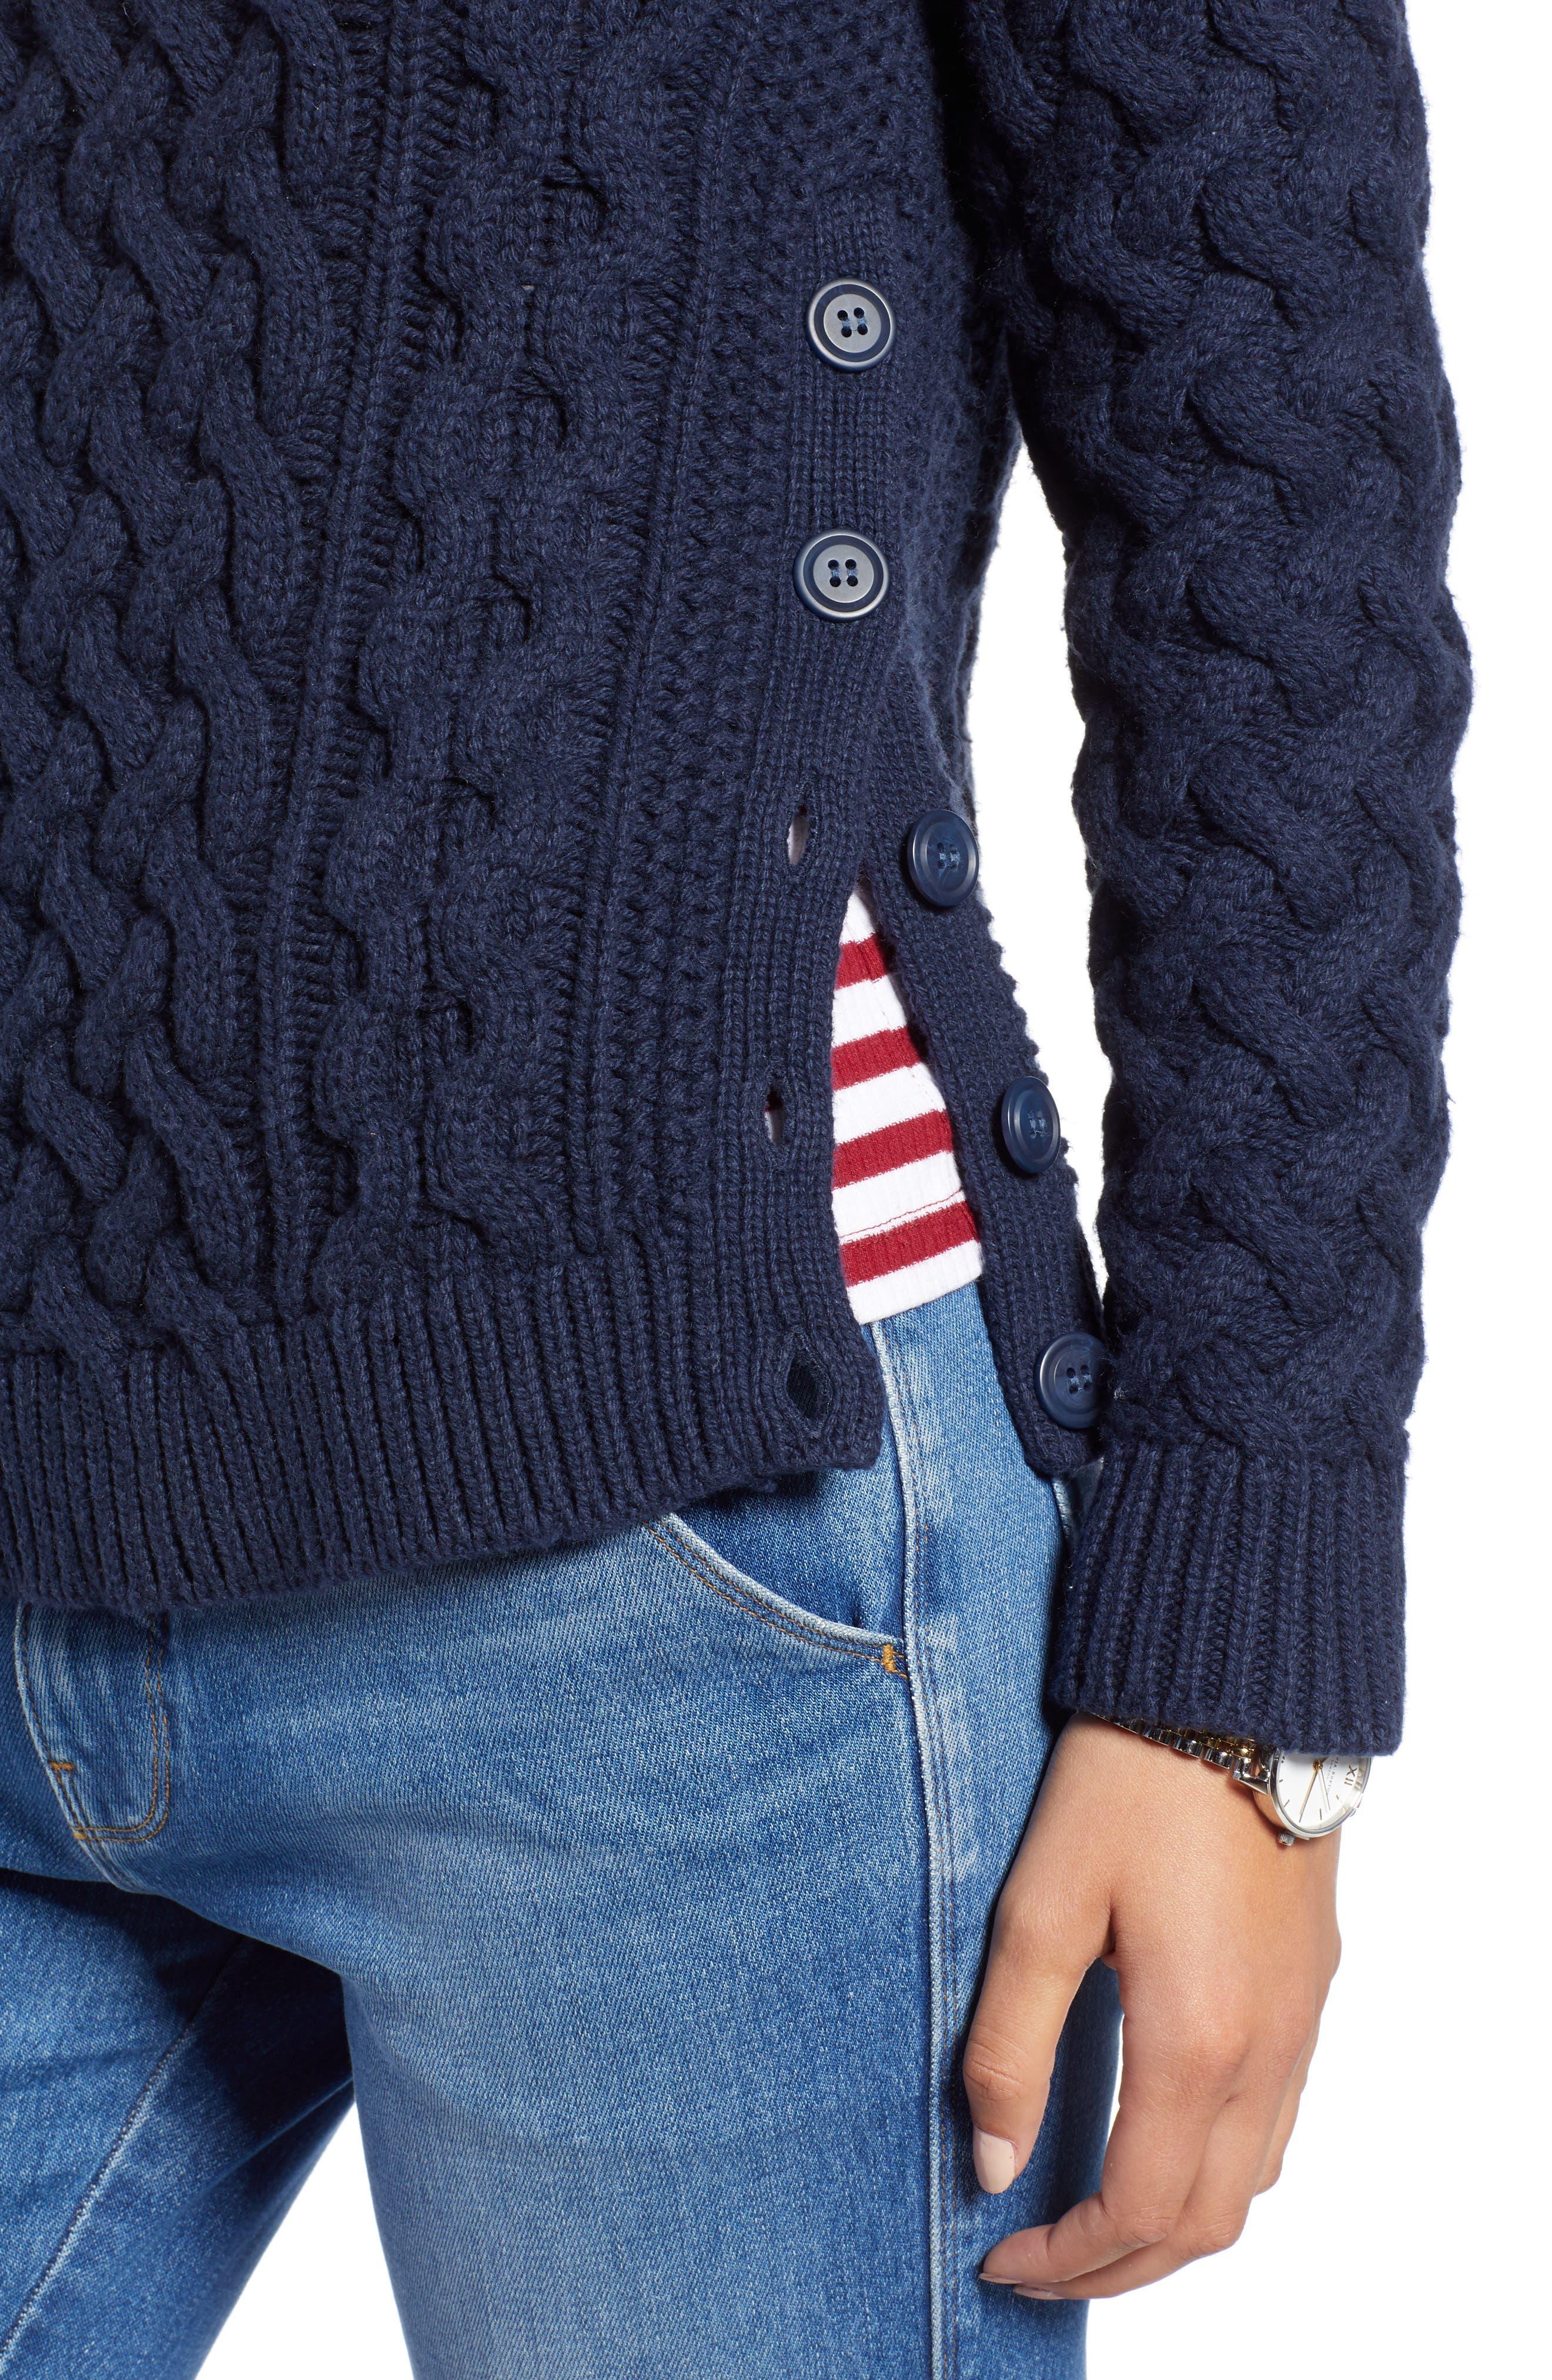 Fisherwoman Crewneck Pullover Sweater,                             Alternate thumbnail 4, color,                             NAVY BLAZER